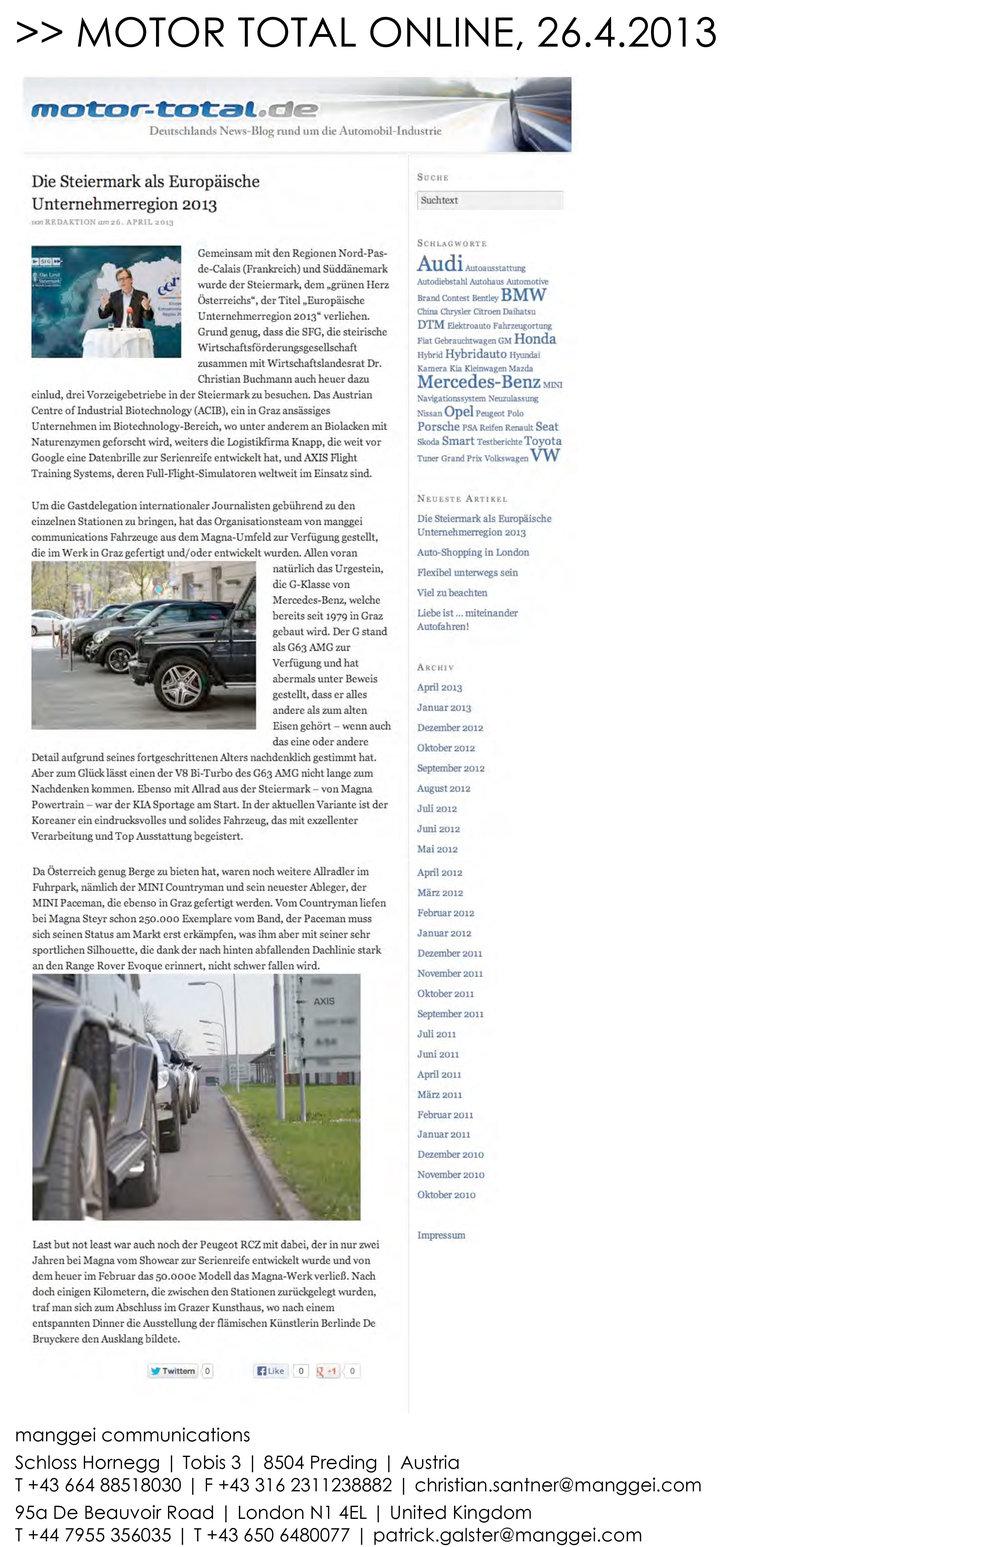 manggei-communications---presse-clippings-komplett---journalistenreise-2013_-12.jpg